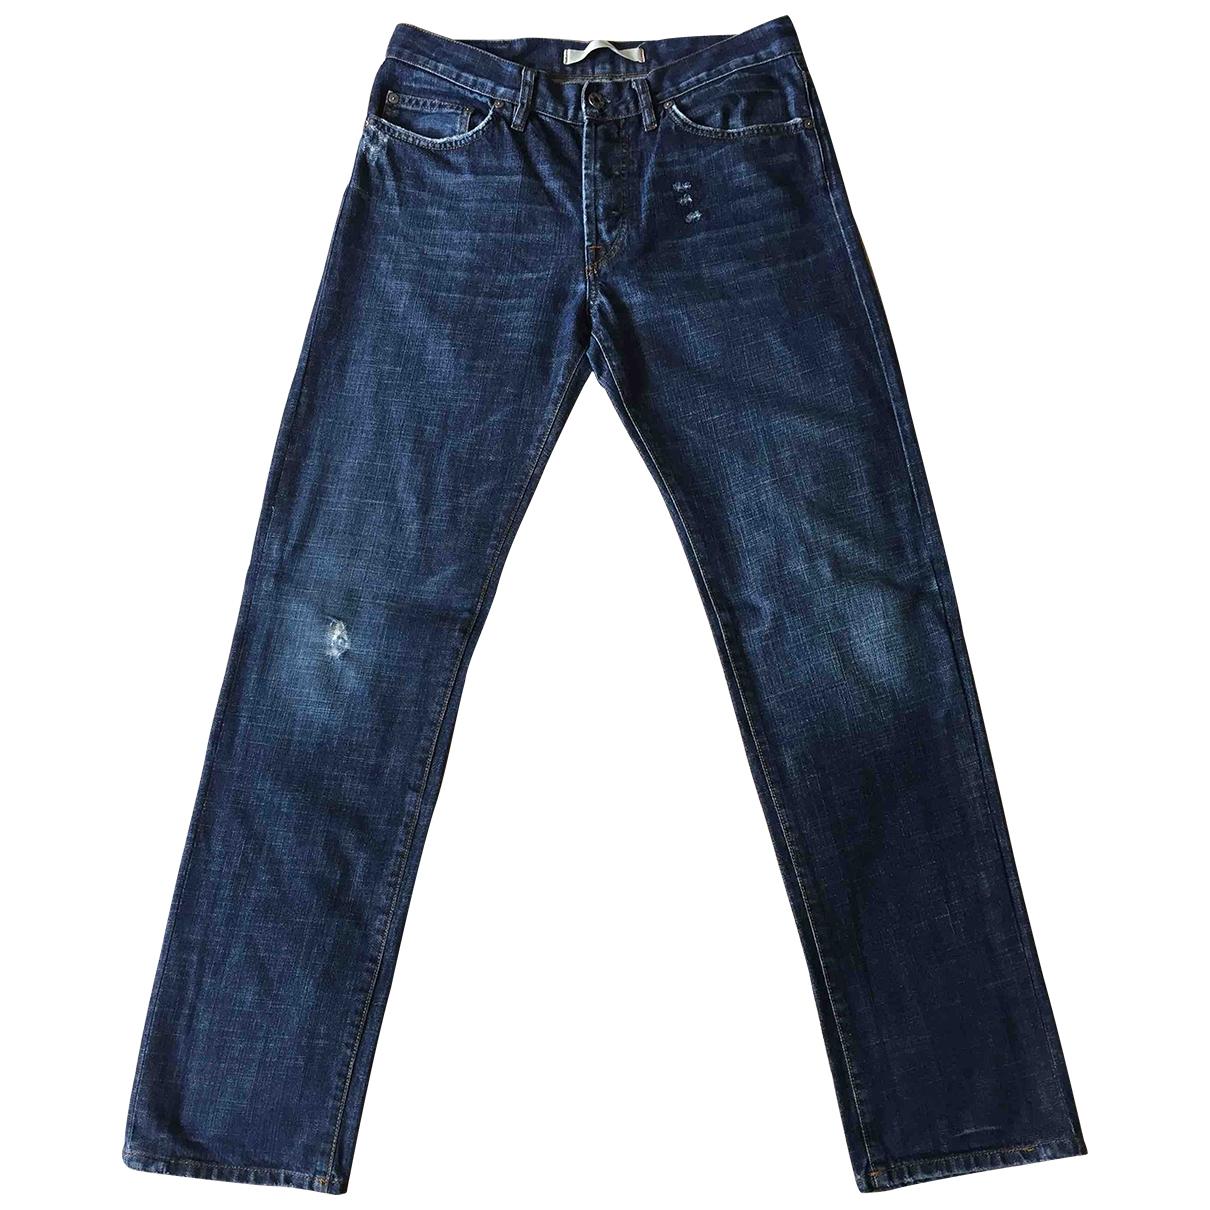 Mauro Grifoni \N Blue Cotton Jeans for Men 34 US